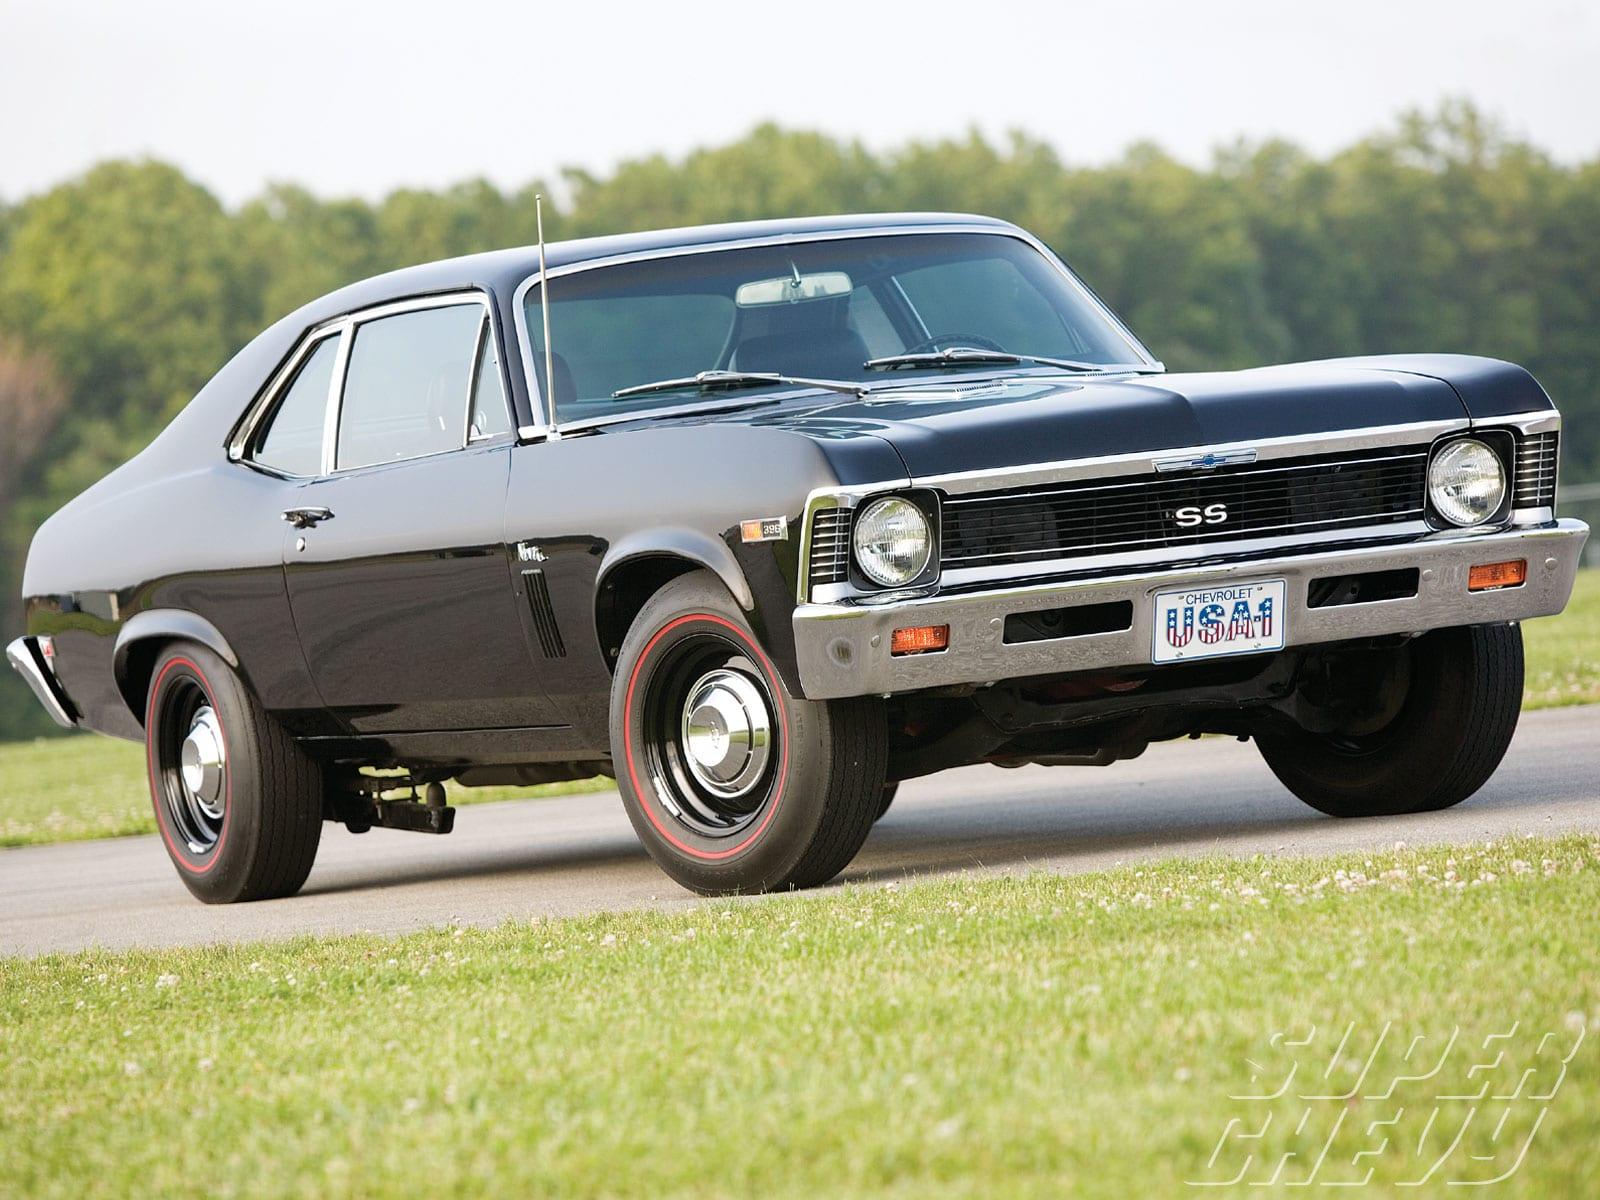 The Chevy Nova Through the Years